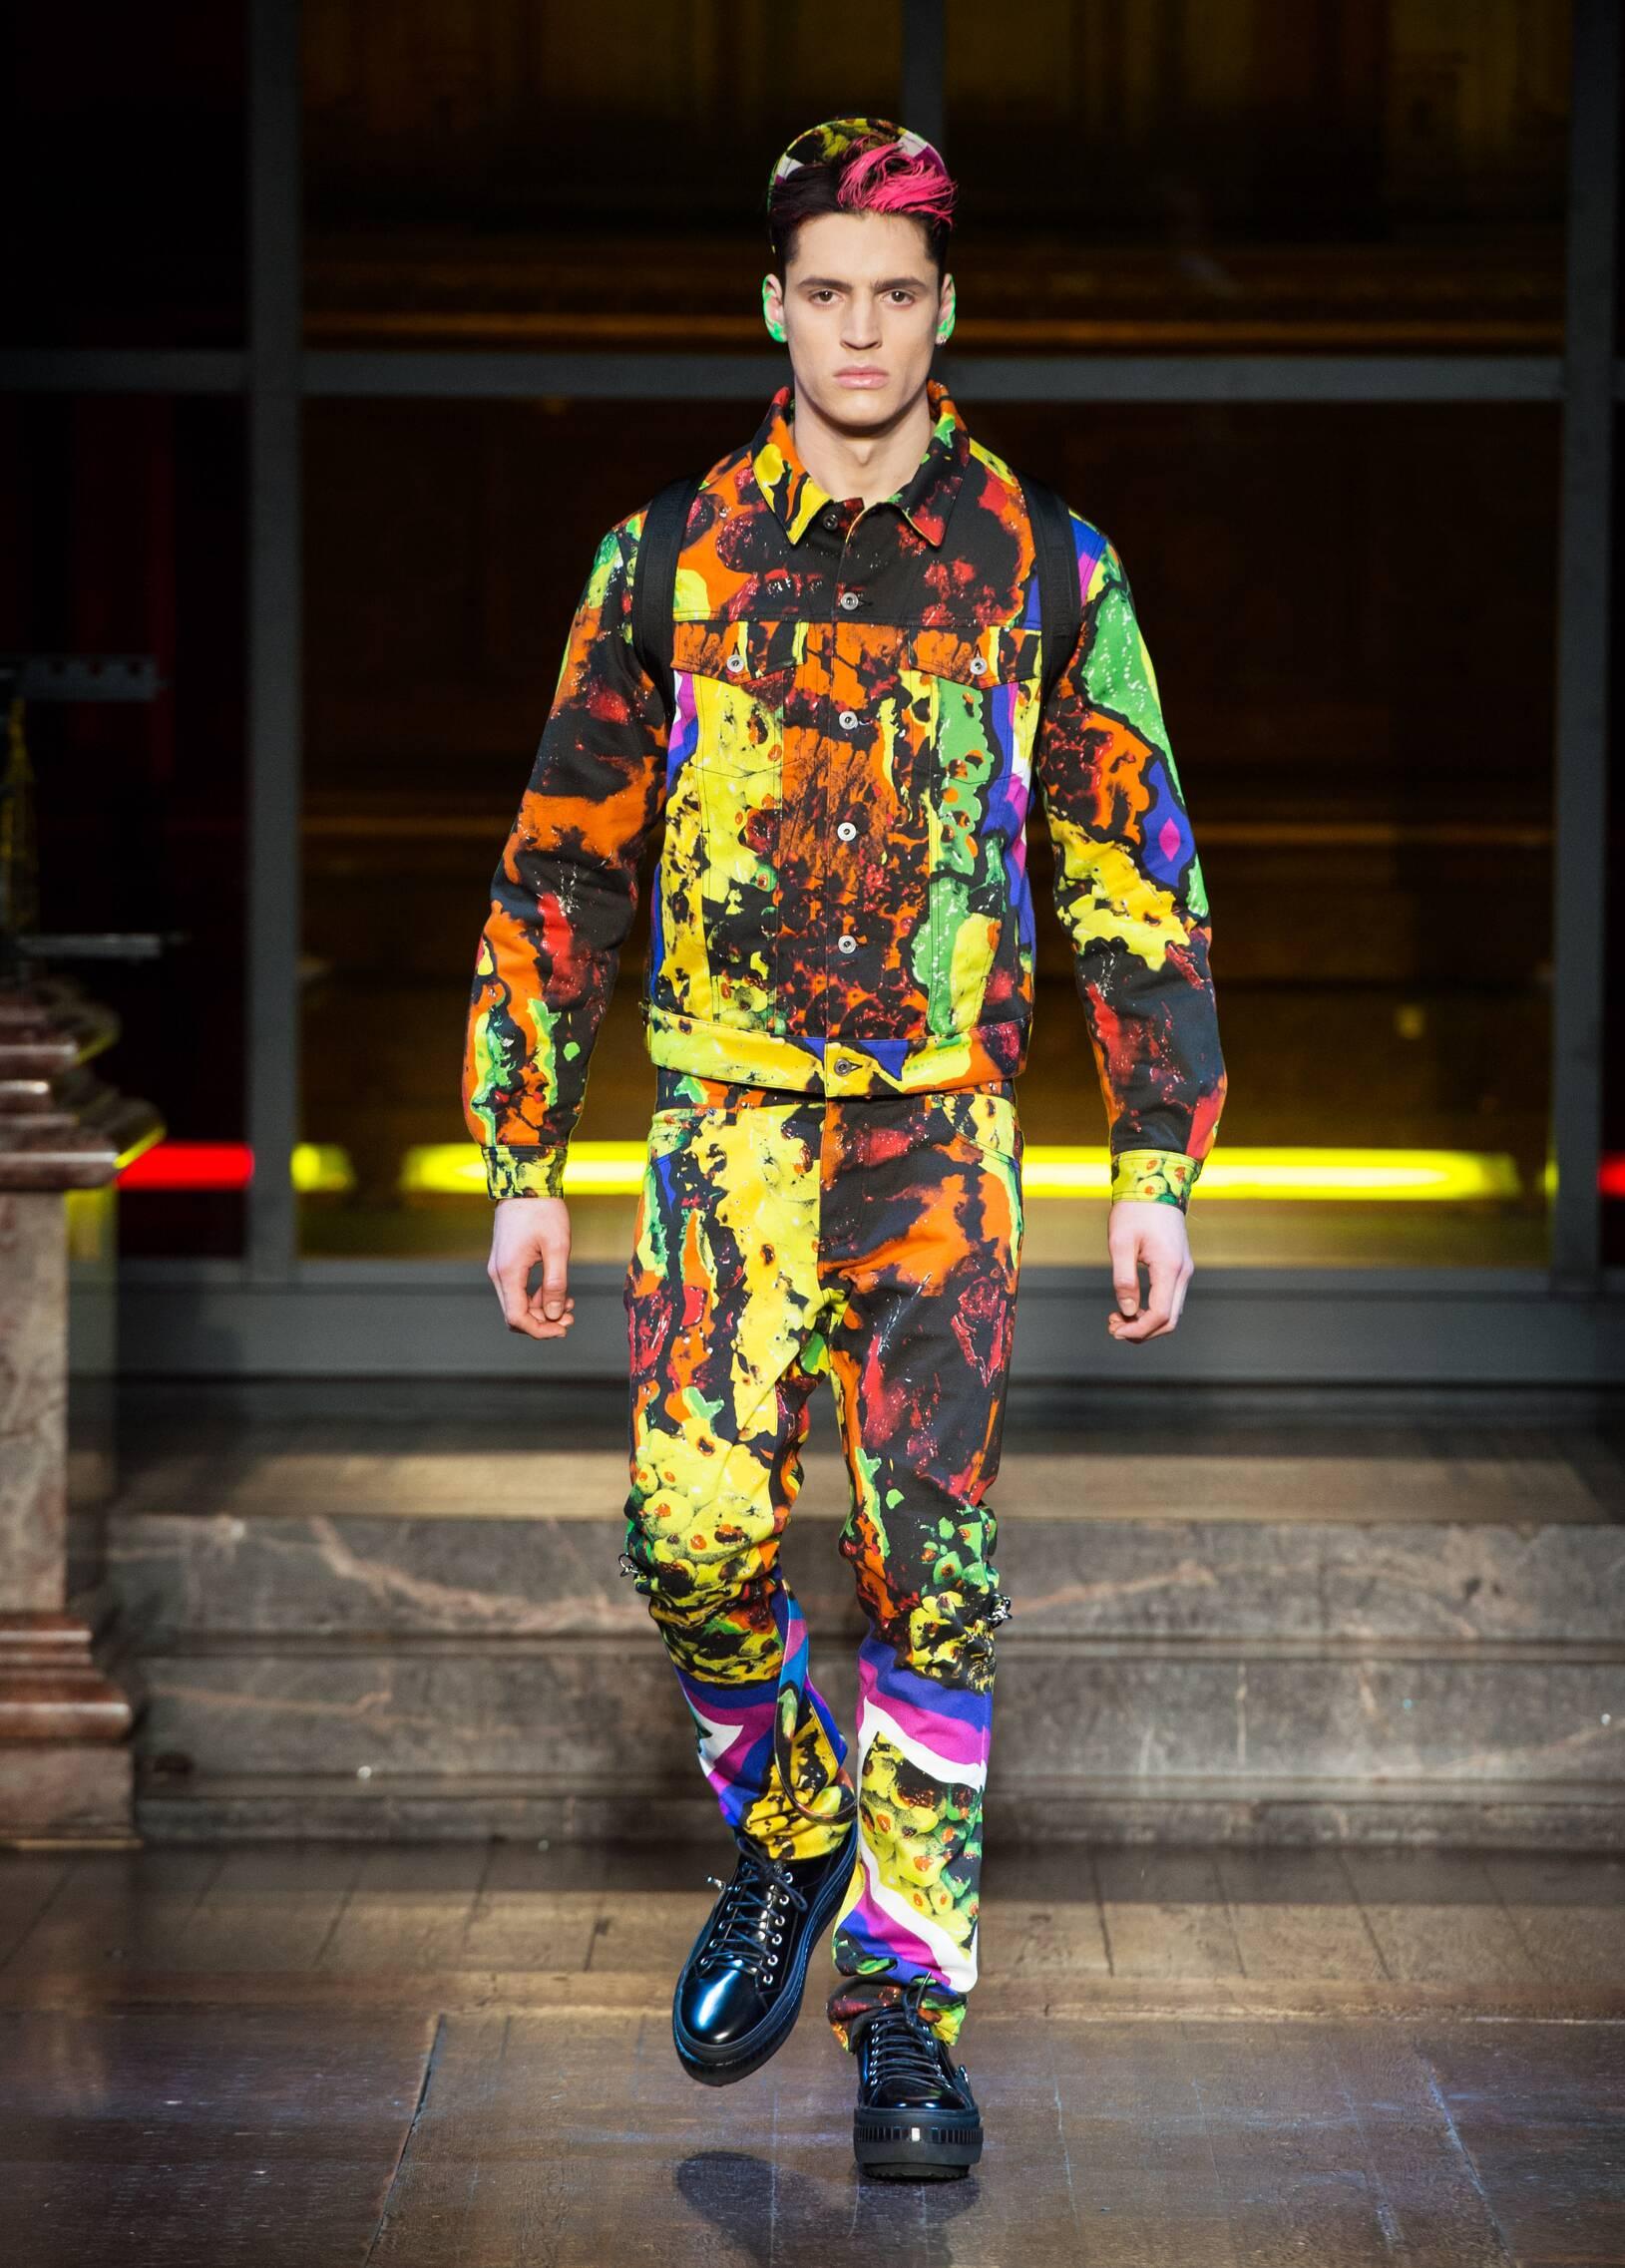 FW 2016 2017 Moschino Fashion Show London